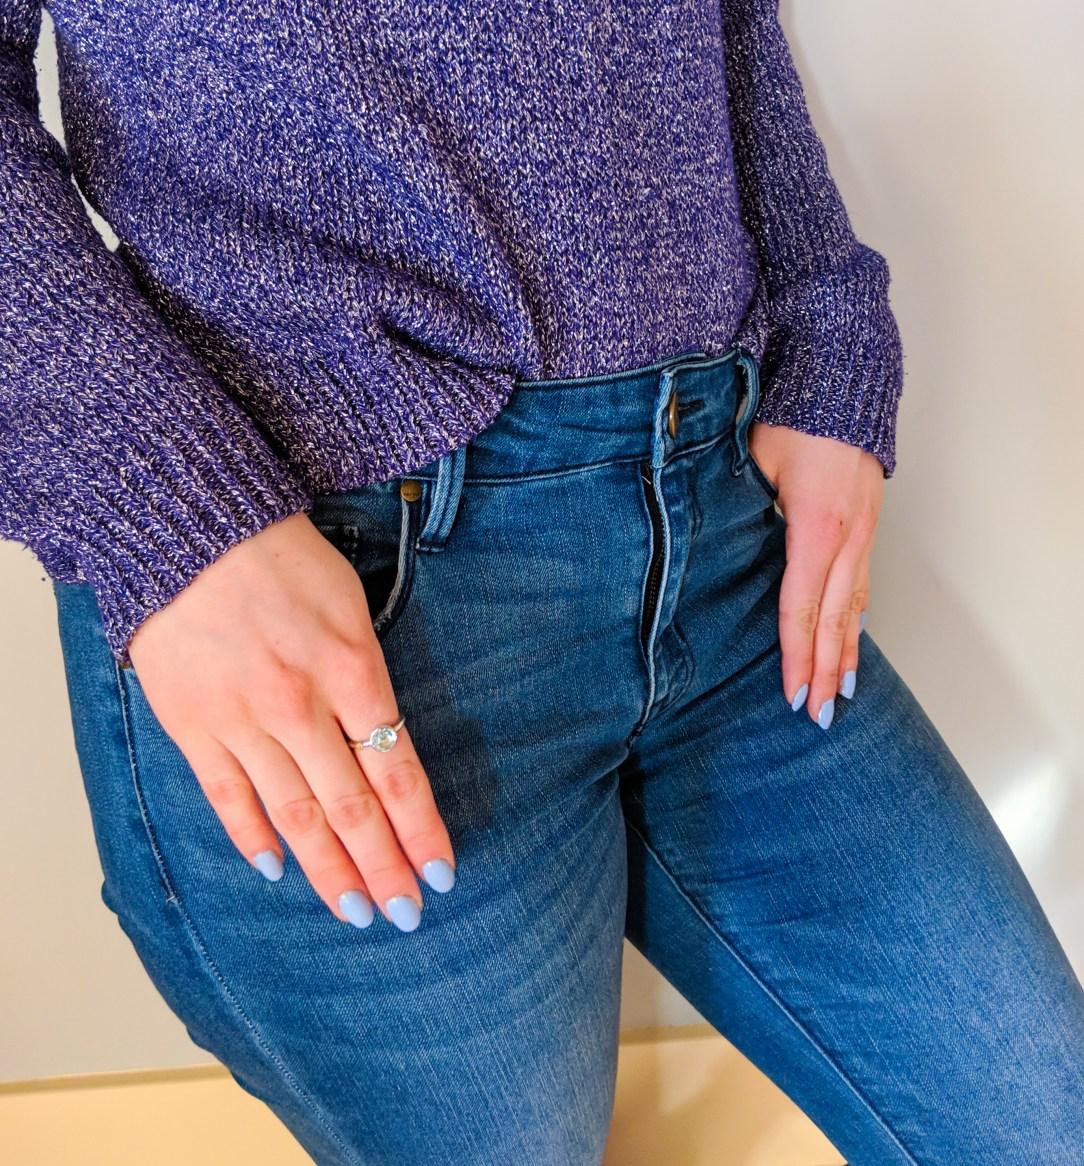 pastel blue nail polish, periwinkle, Sally Hansen